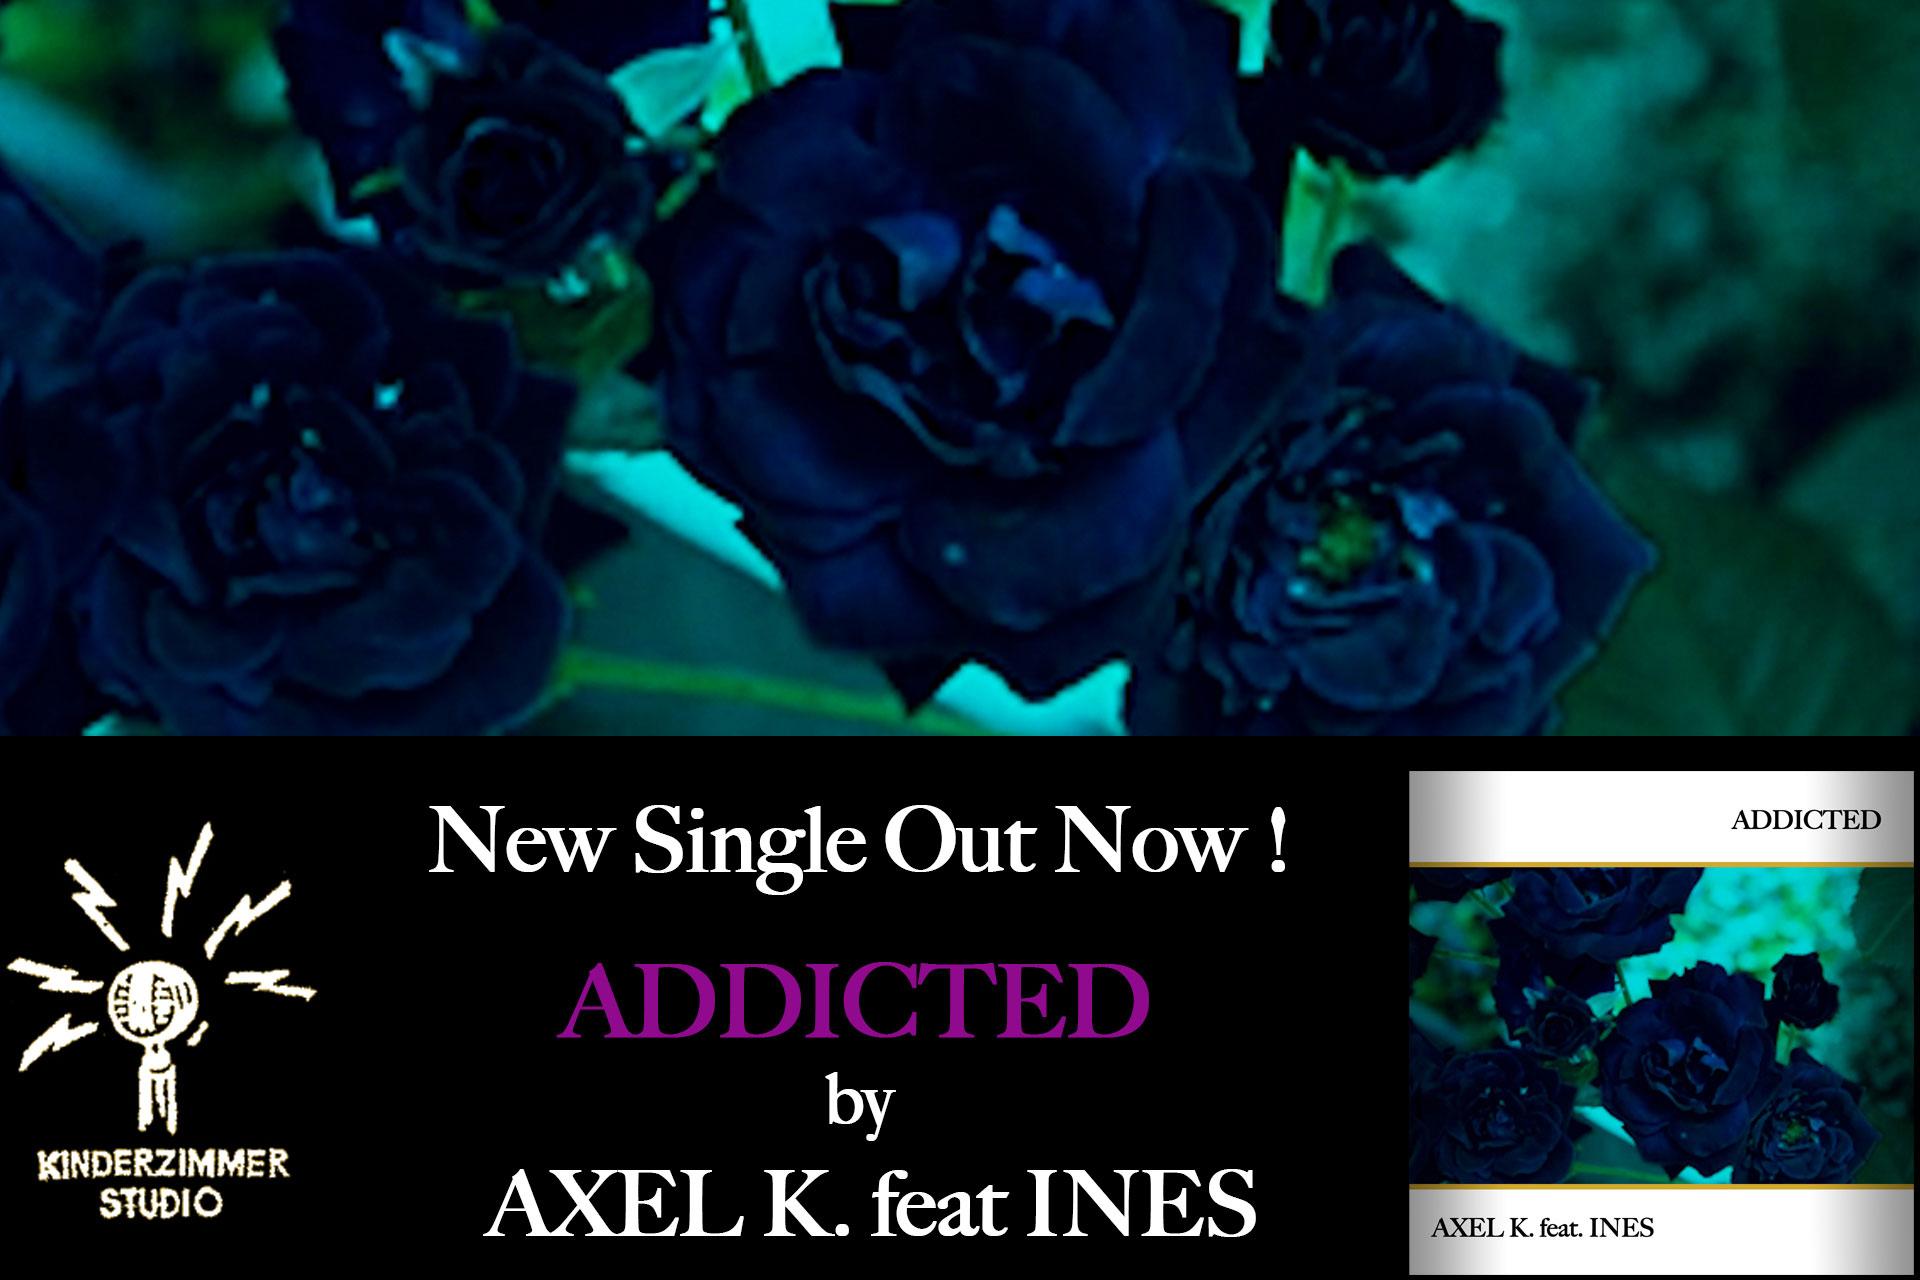 addicted-axel-k-featuring-ines-gorka